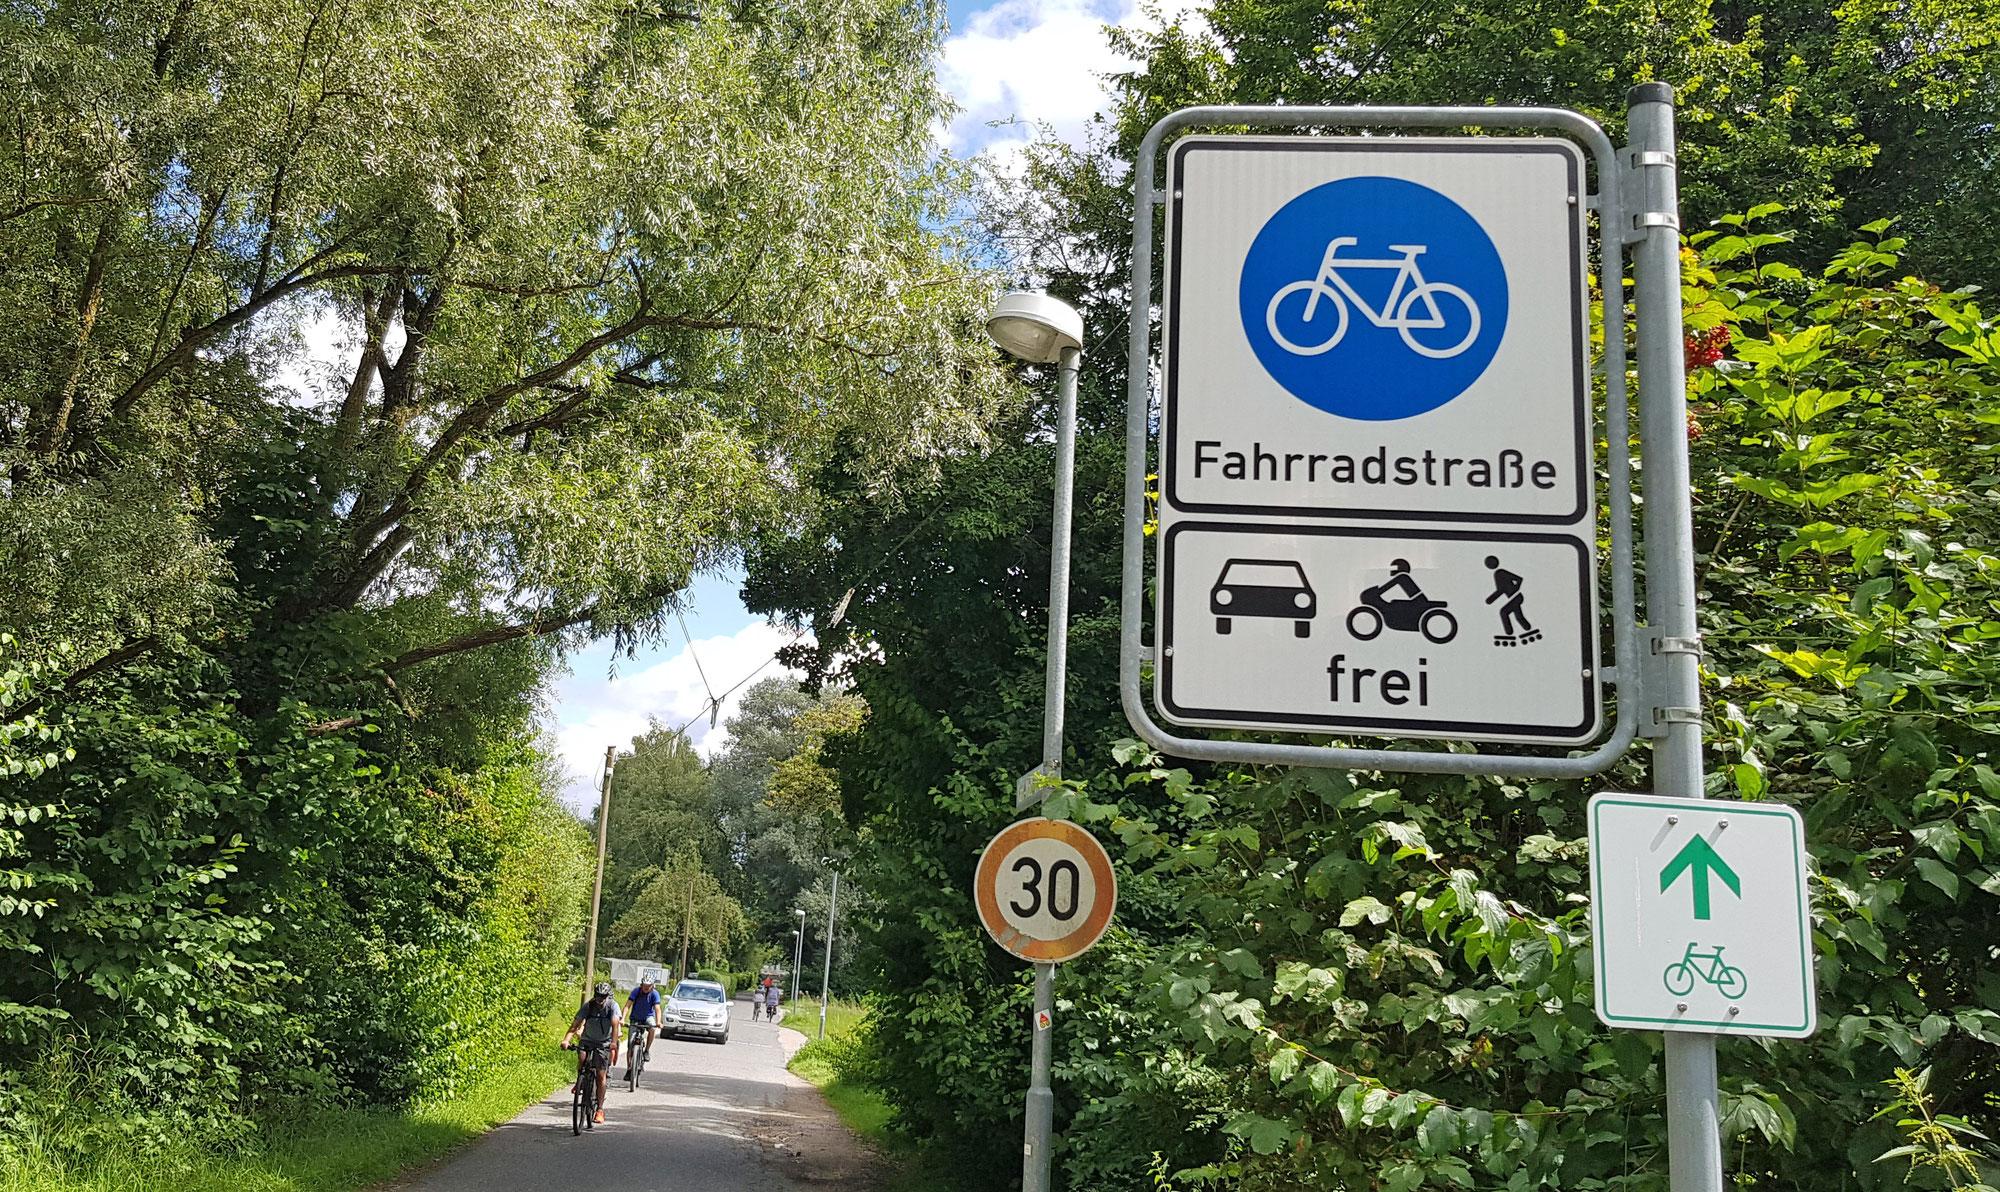 Fahrradstraßen: Radelnde geben den Ton an